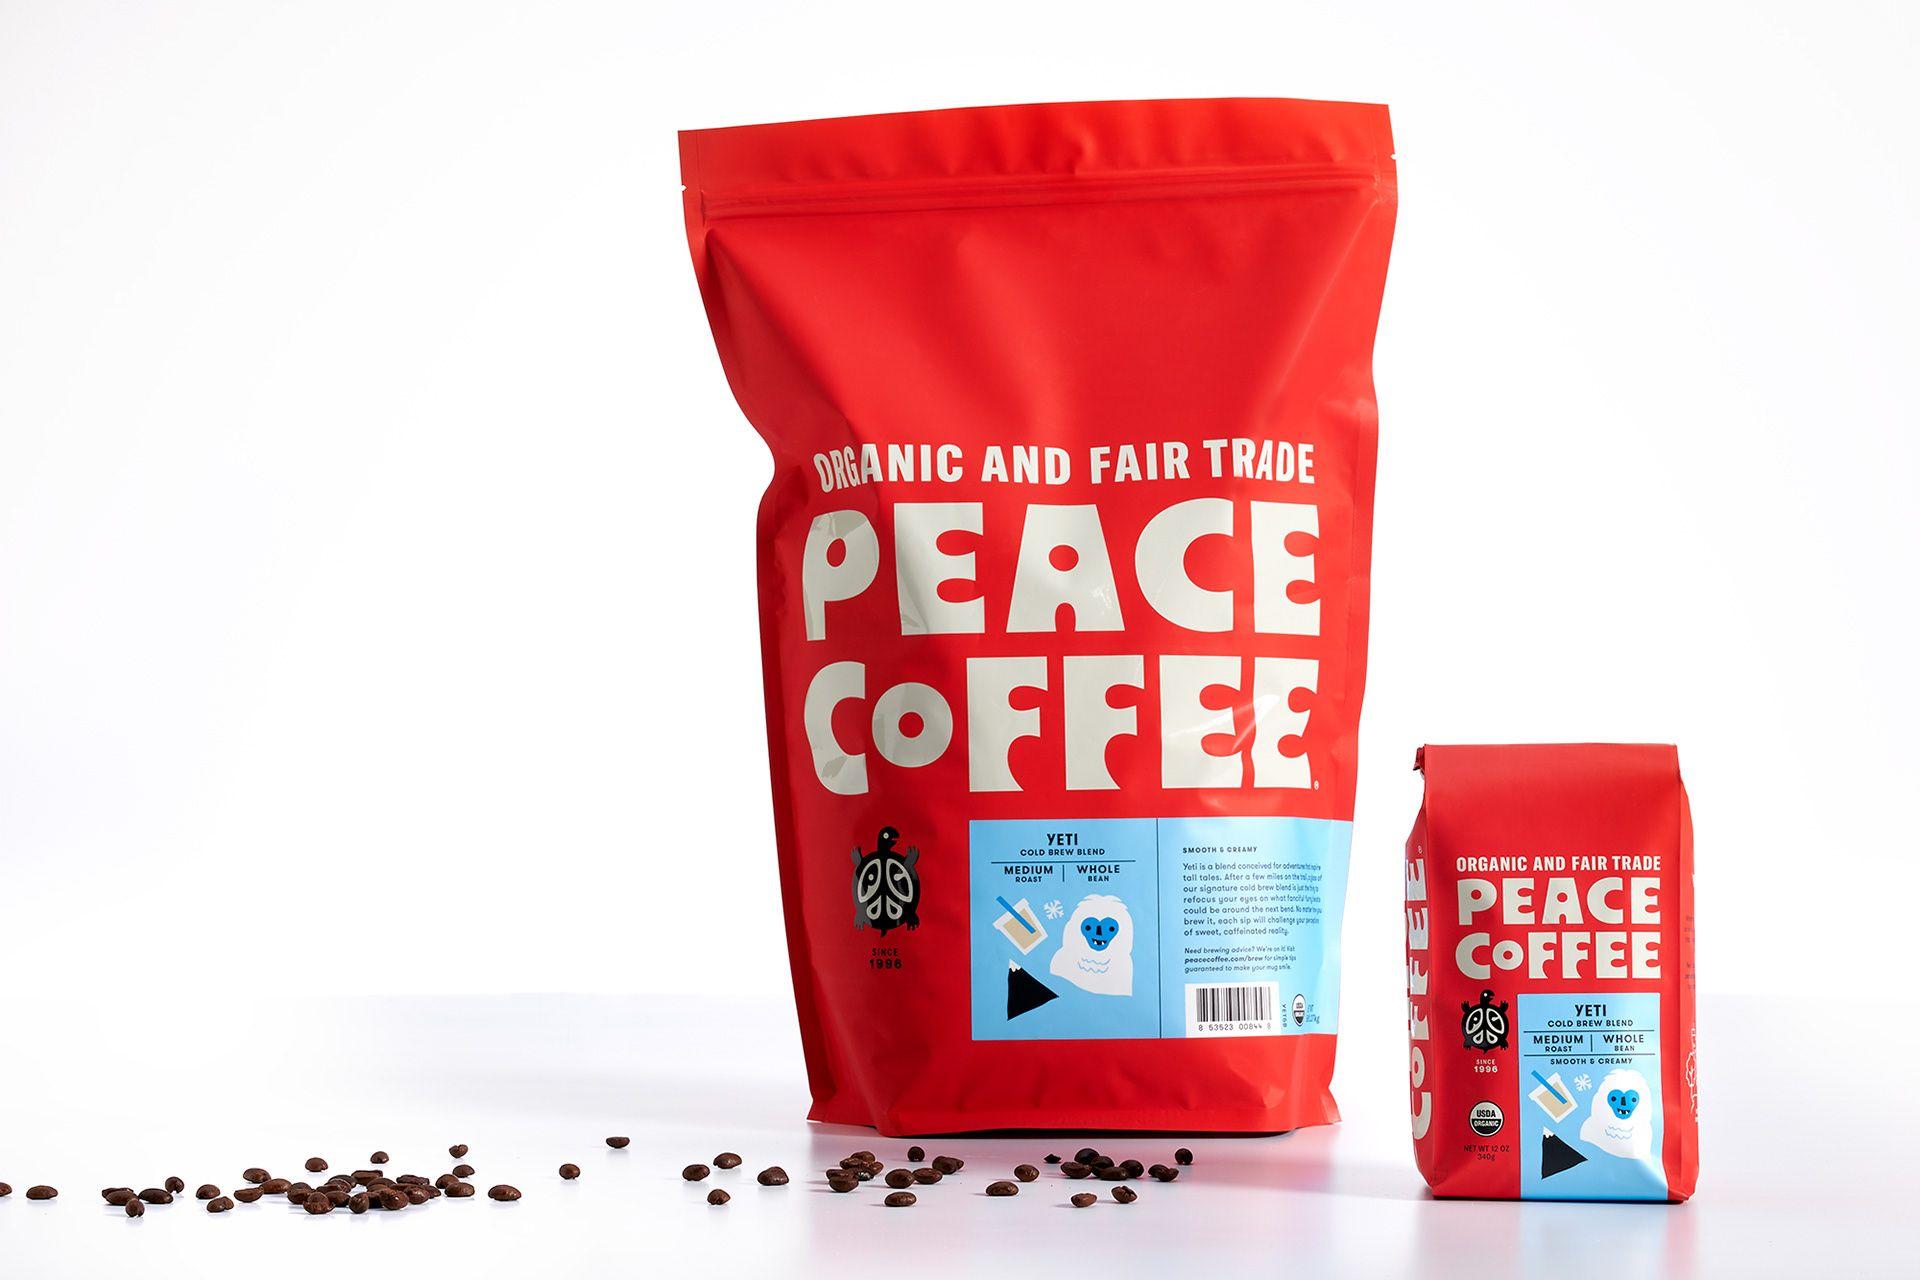 Best Of Behance In 2020 Peace Coffee Organic Fair Trade Coffee Creative Packaging Design